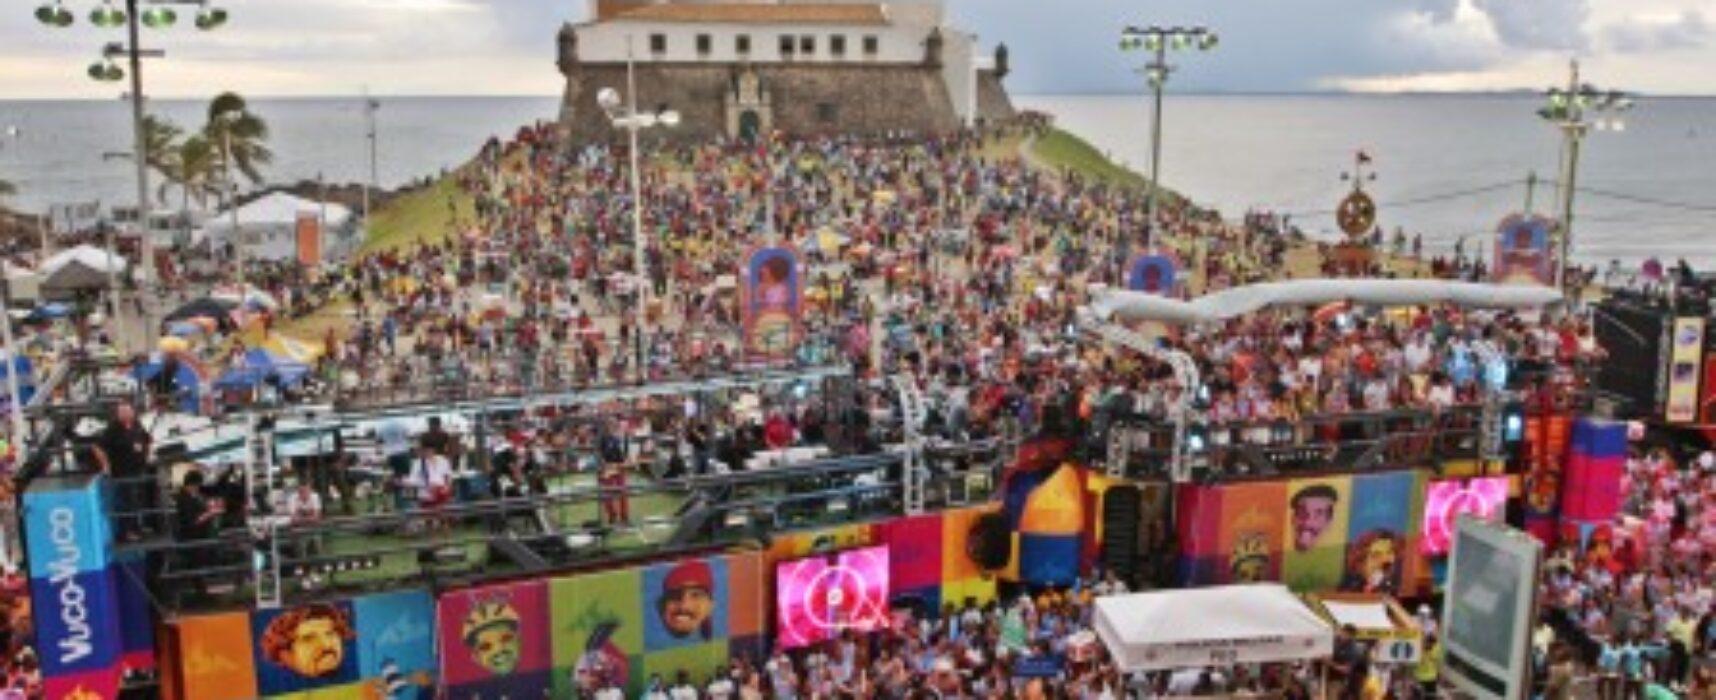 'Vai depender de termos a vacina', diz Neto sobre carnaval 2021